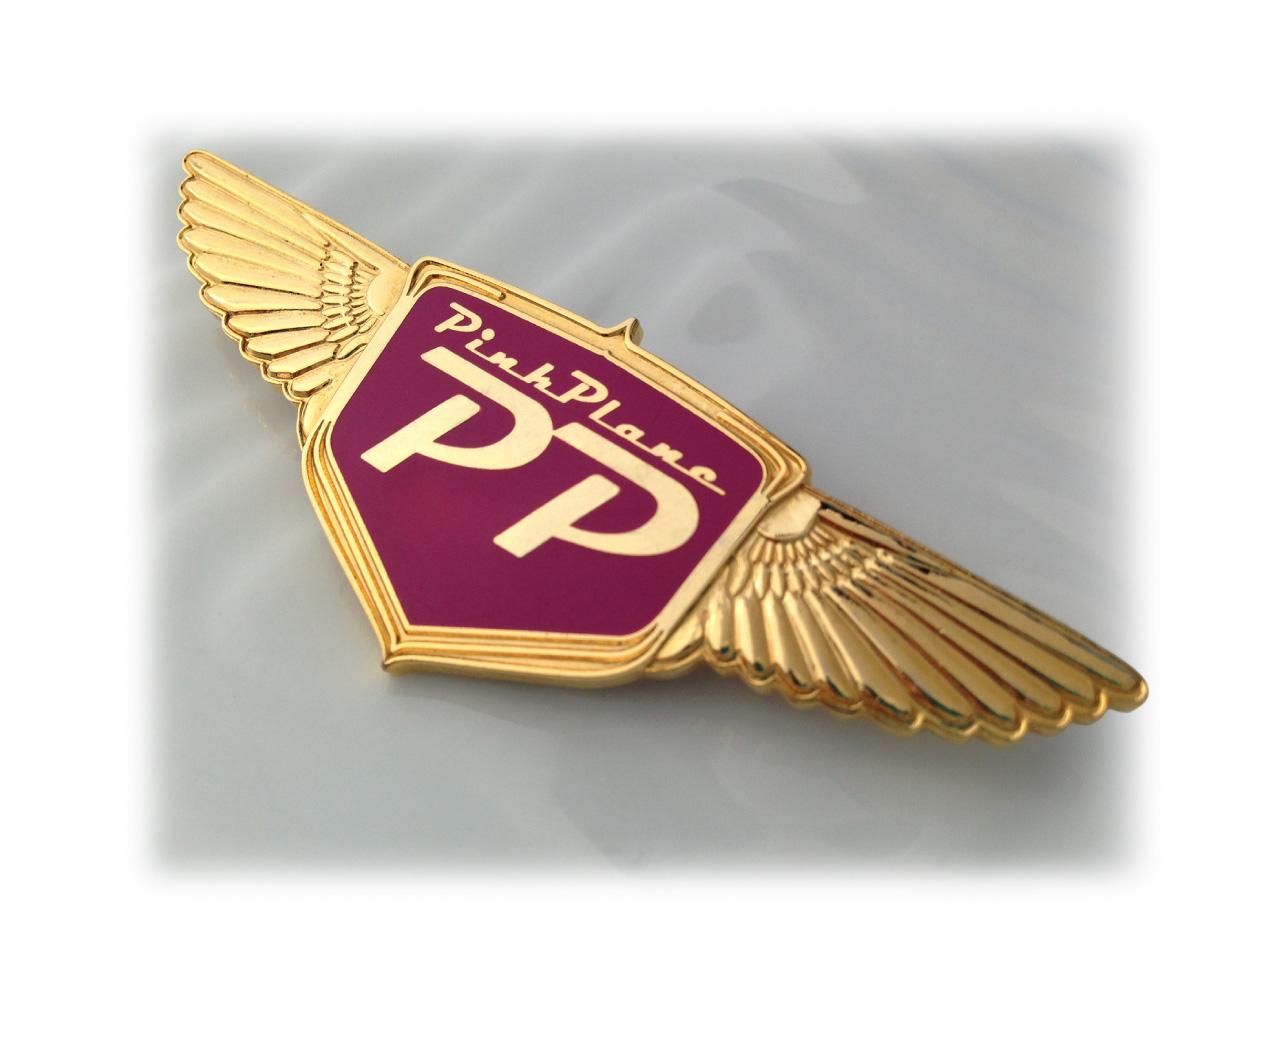 Pink Plane logo and badge